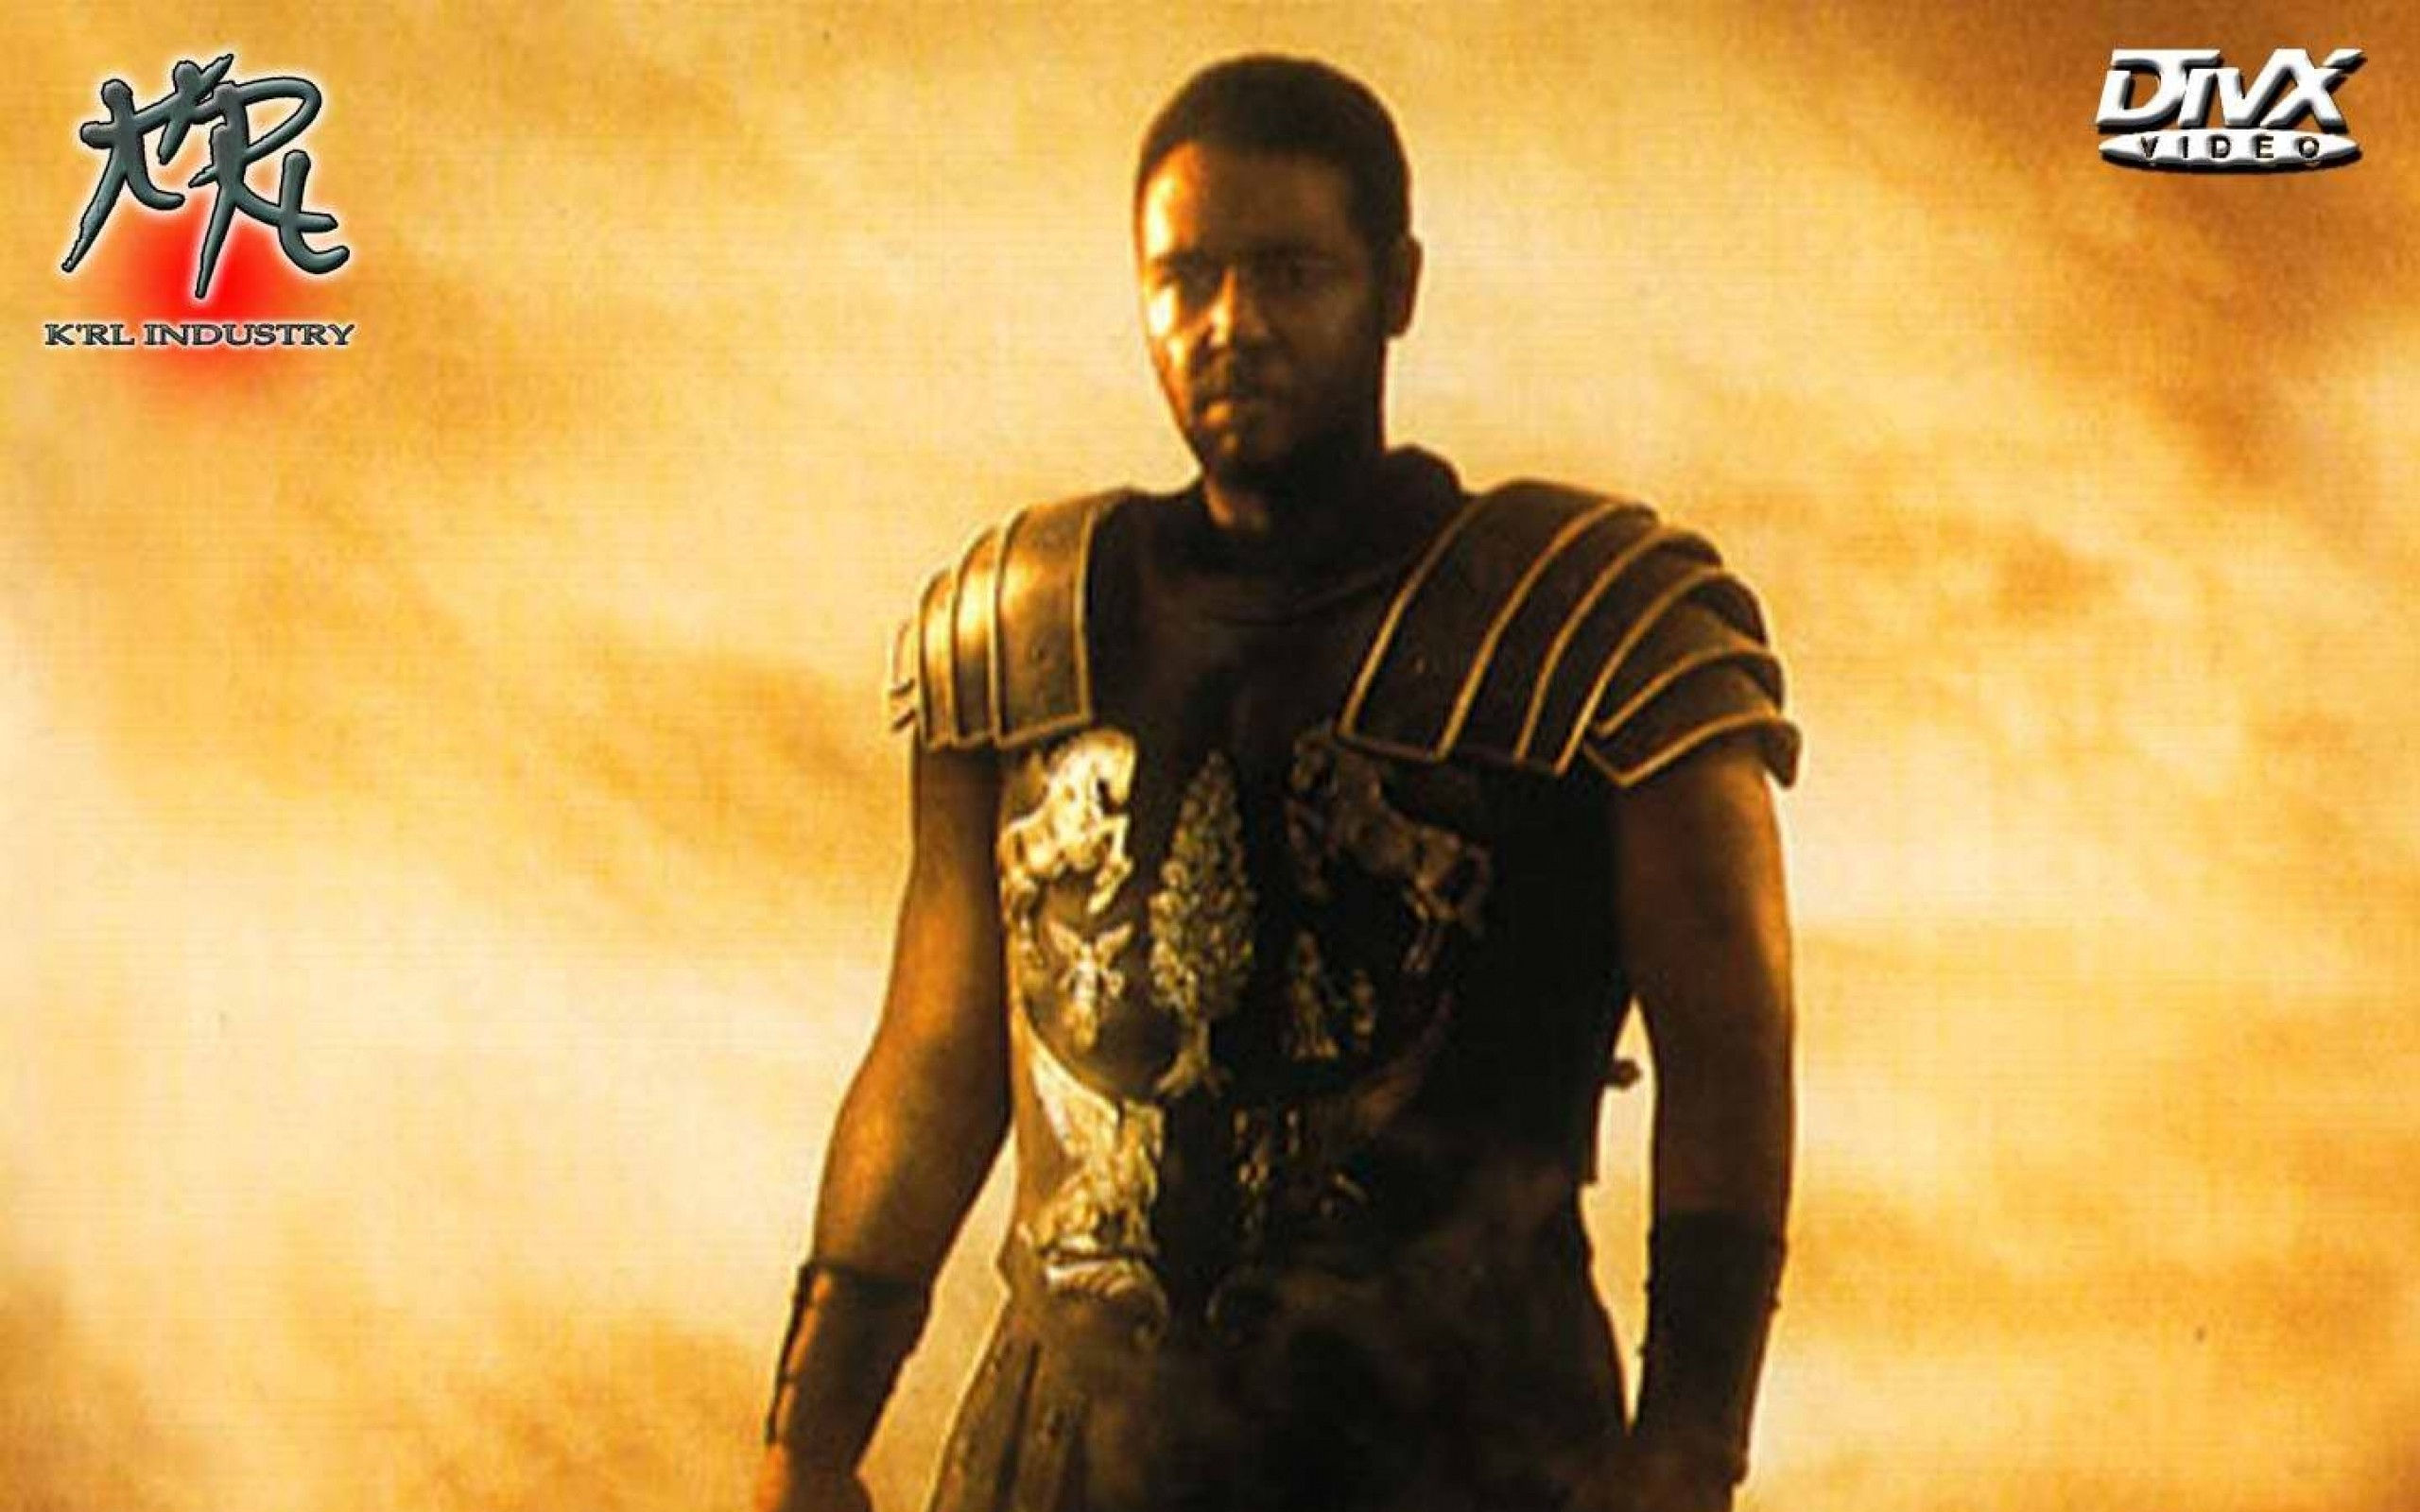 movies gladiator movie russell crowe 1439×1403 wallpaper Art HD Wallpaper